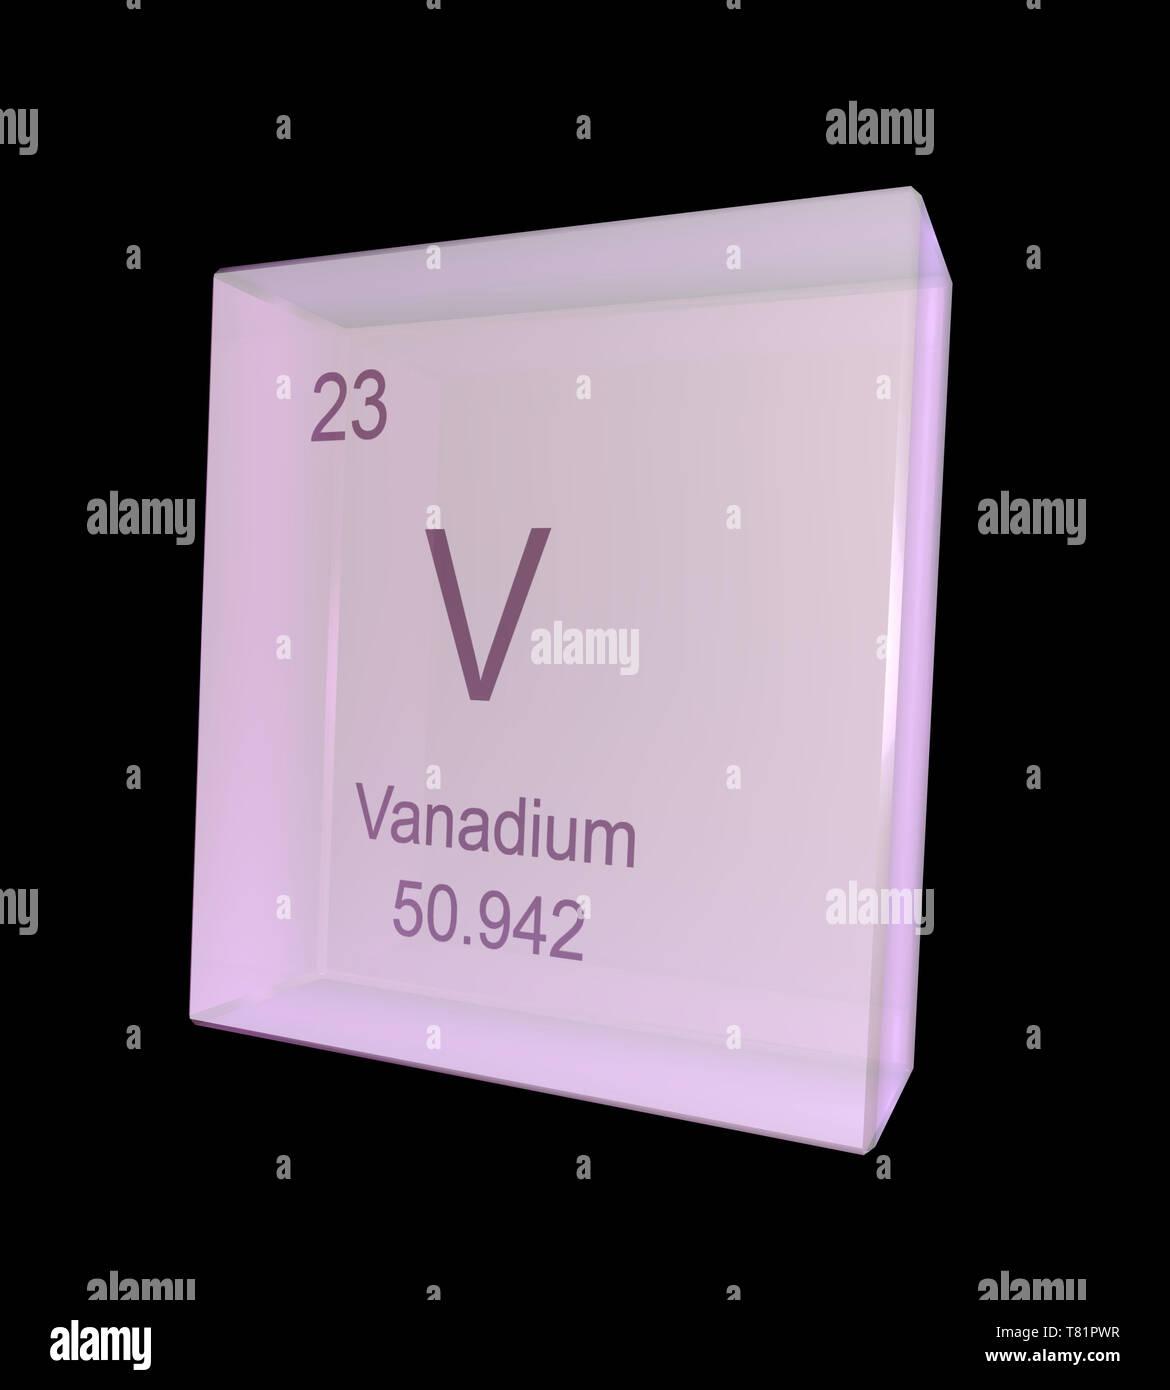 Vanadium, Chemical Element Symbol, Illustration - Stock Image